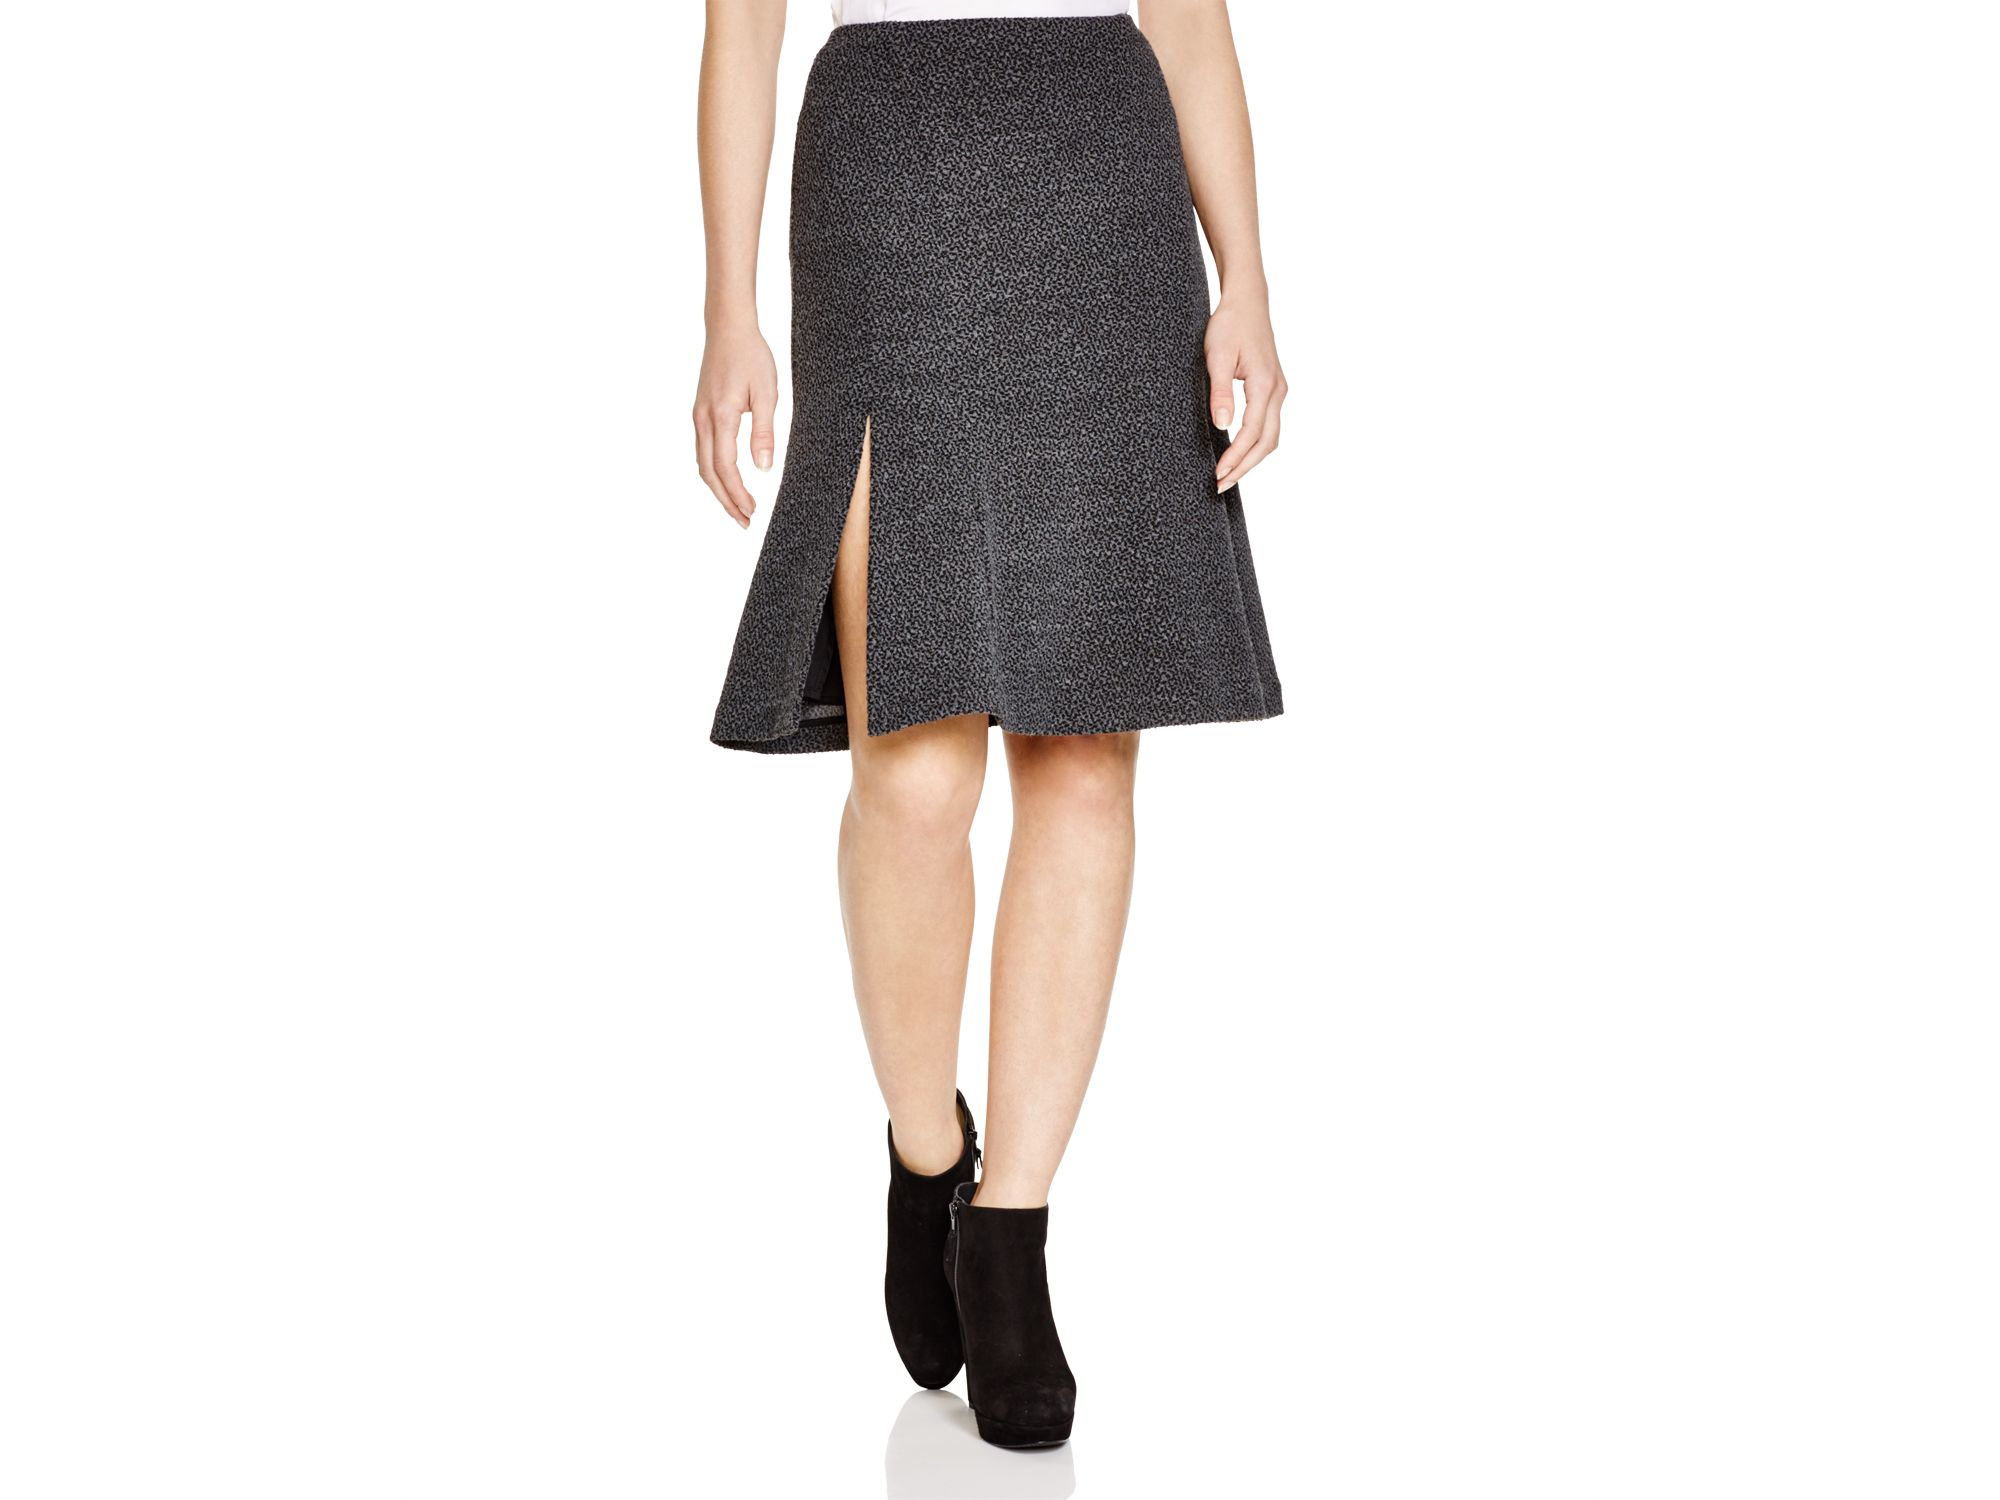 farfetchcom - a new way to shop for fashion